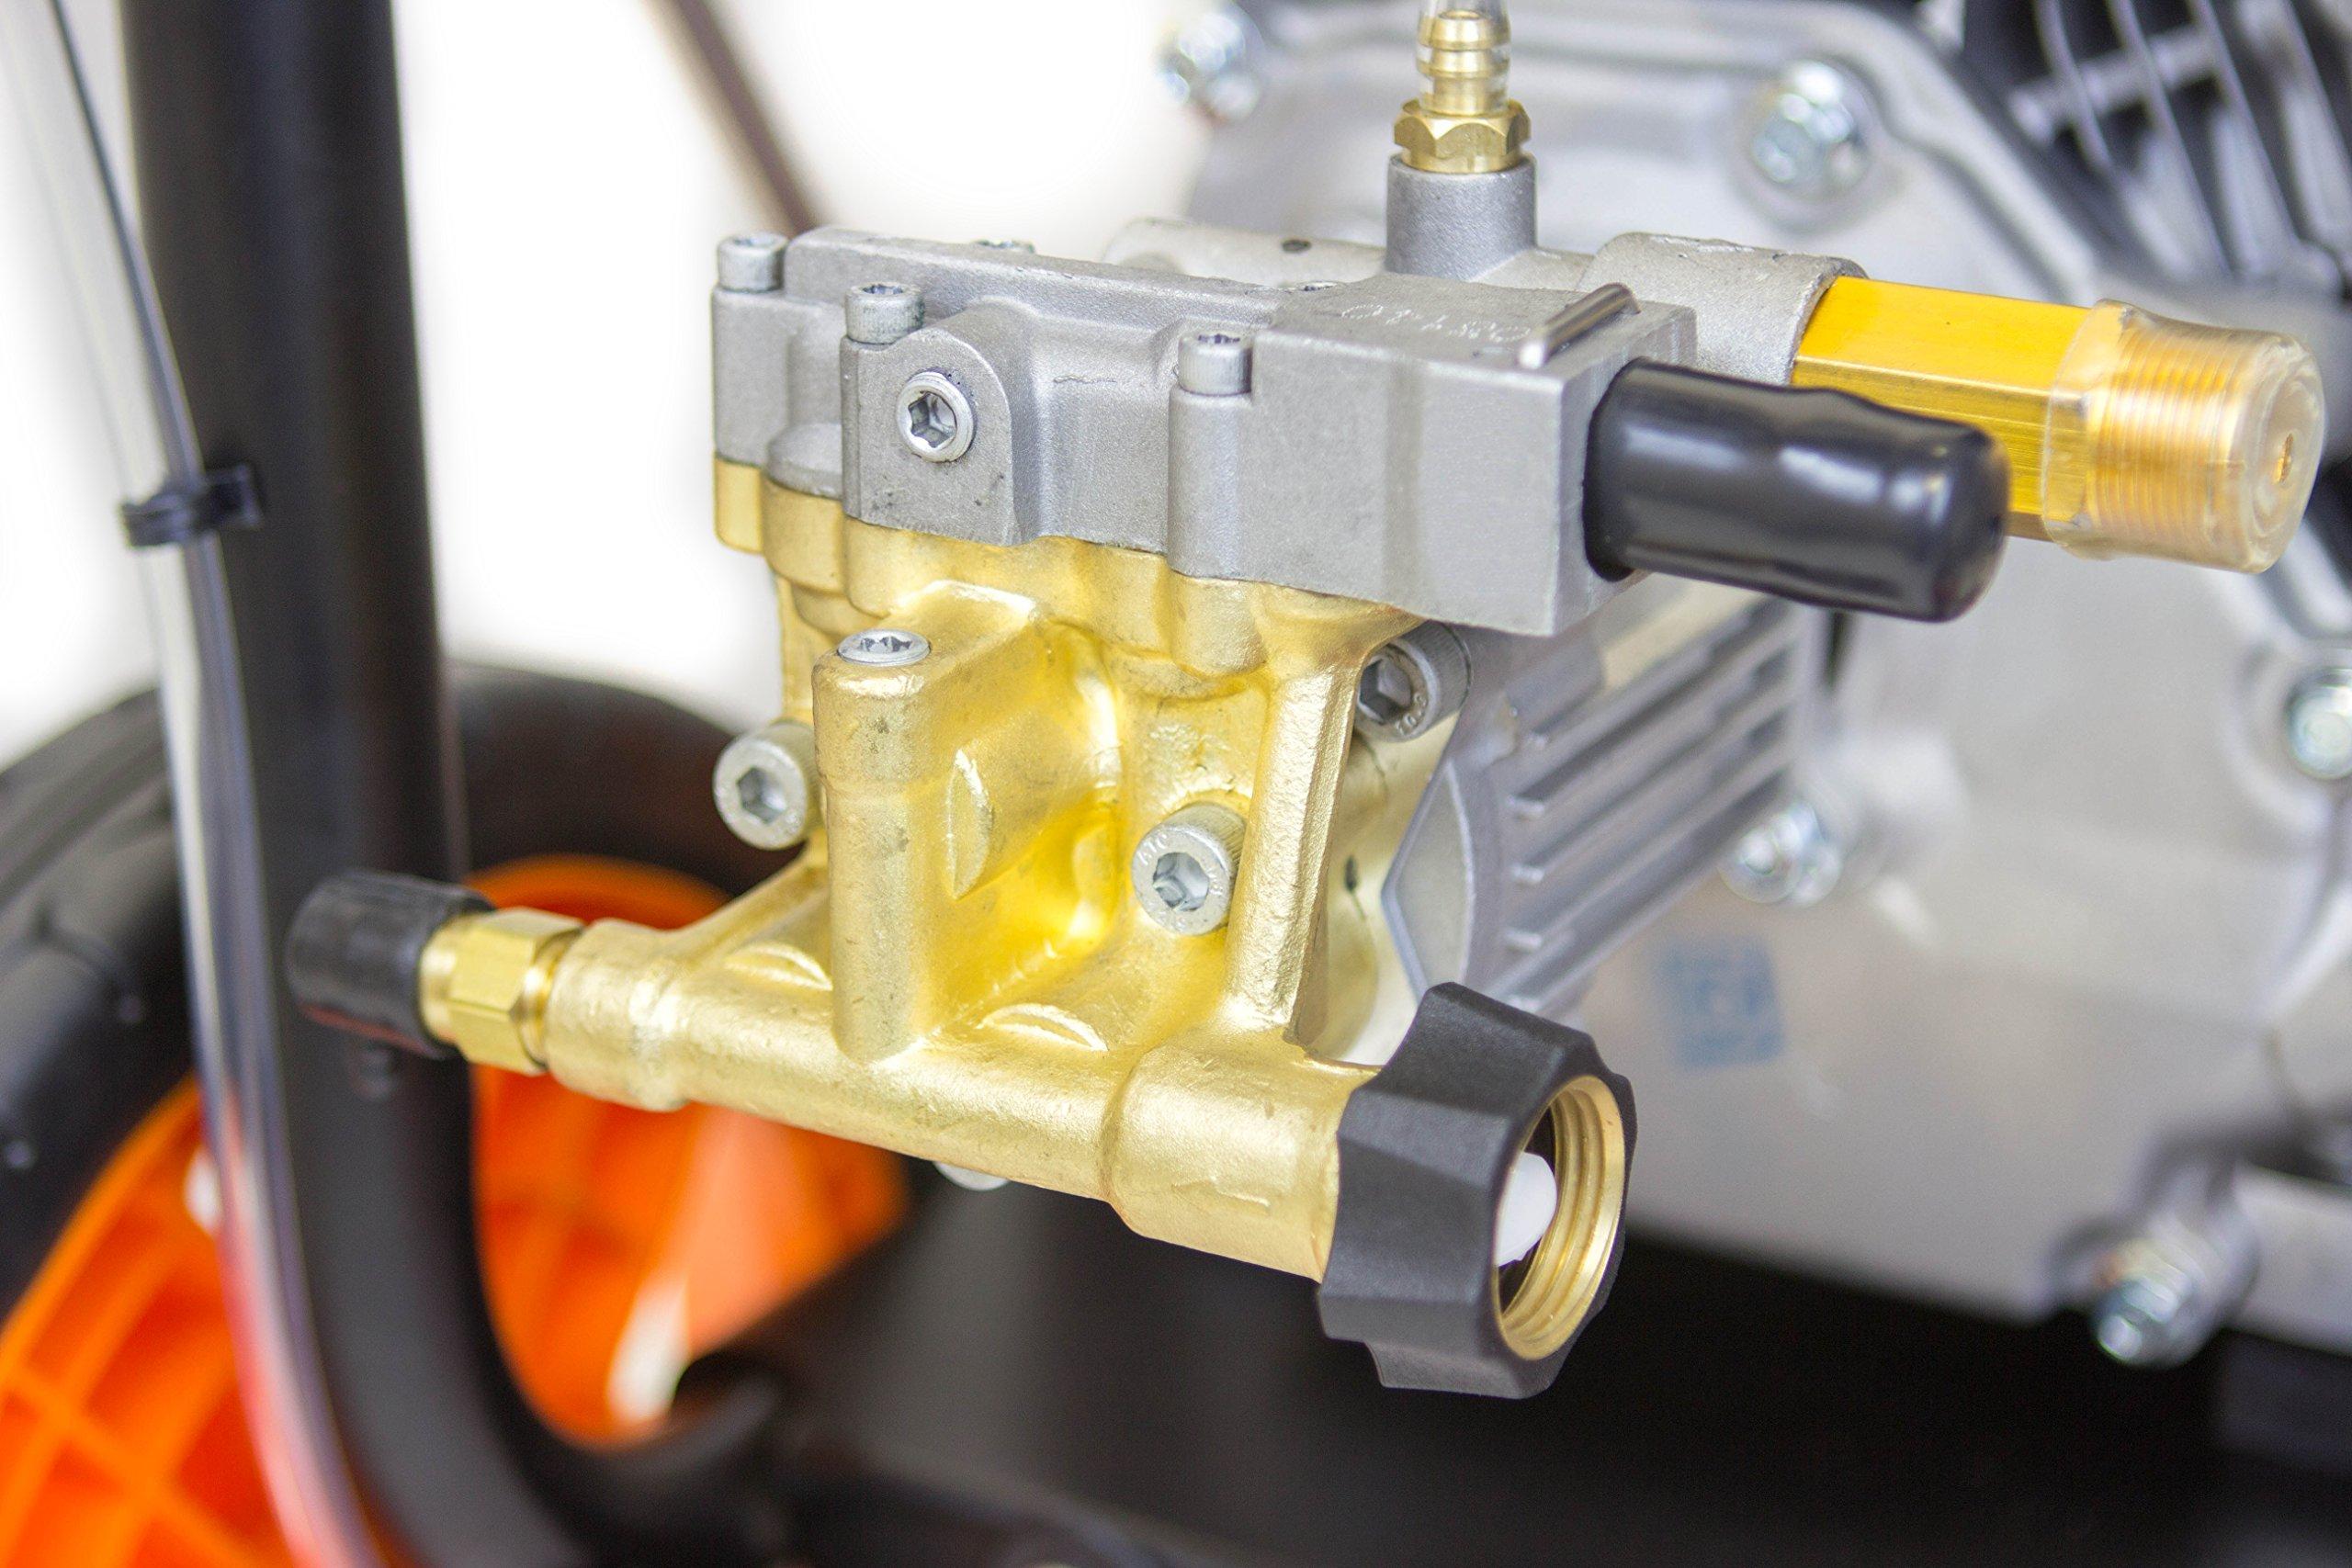 WEN PW31 3100 PSI Gas Pressure Washer, 208 cc by WEN (Image #6)